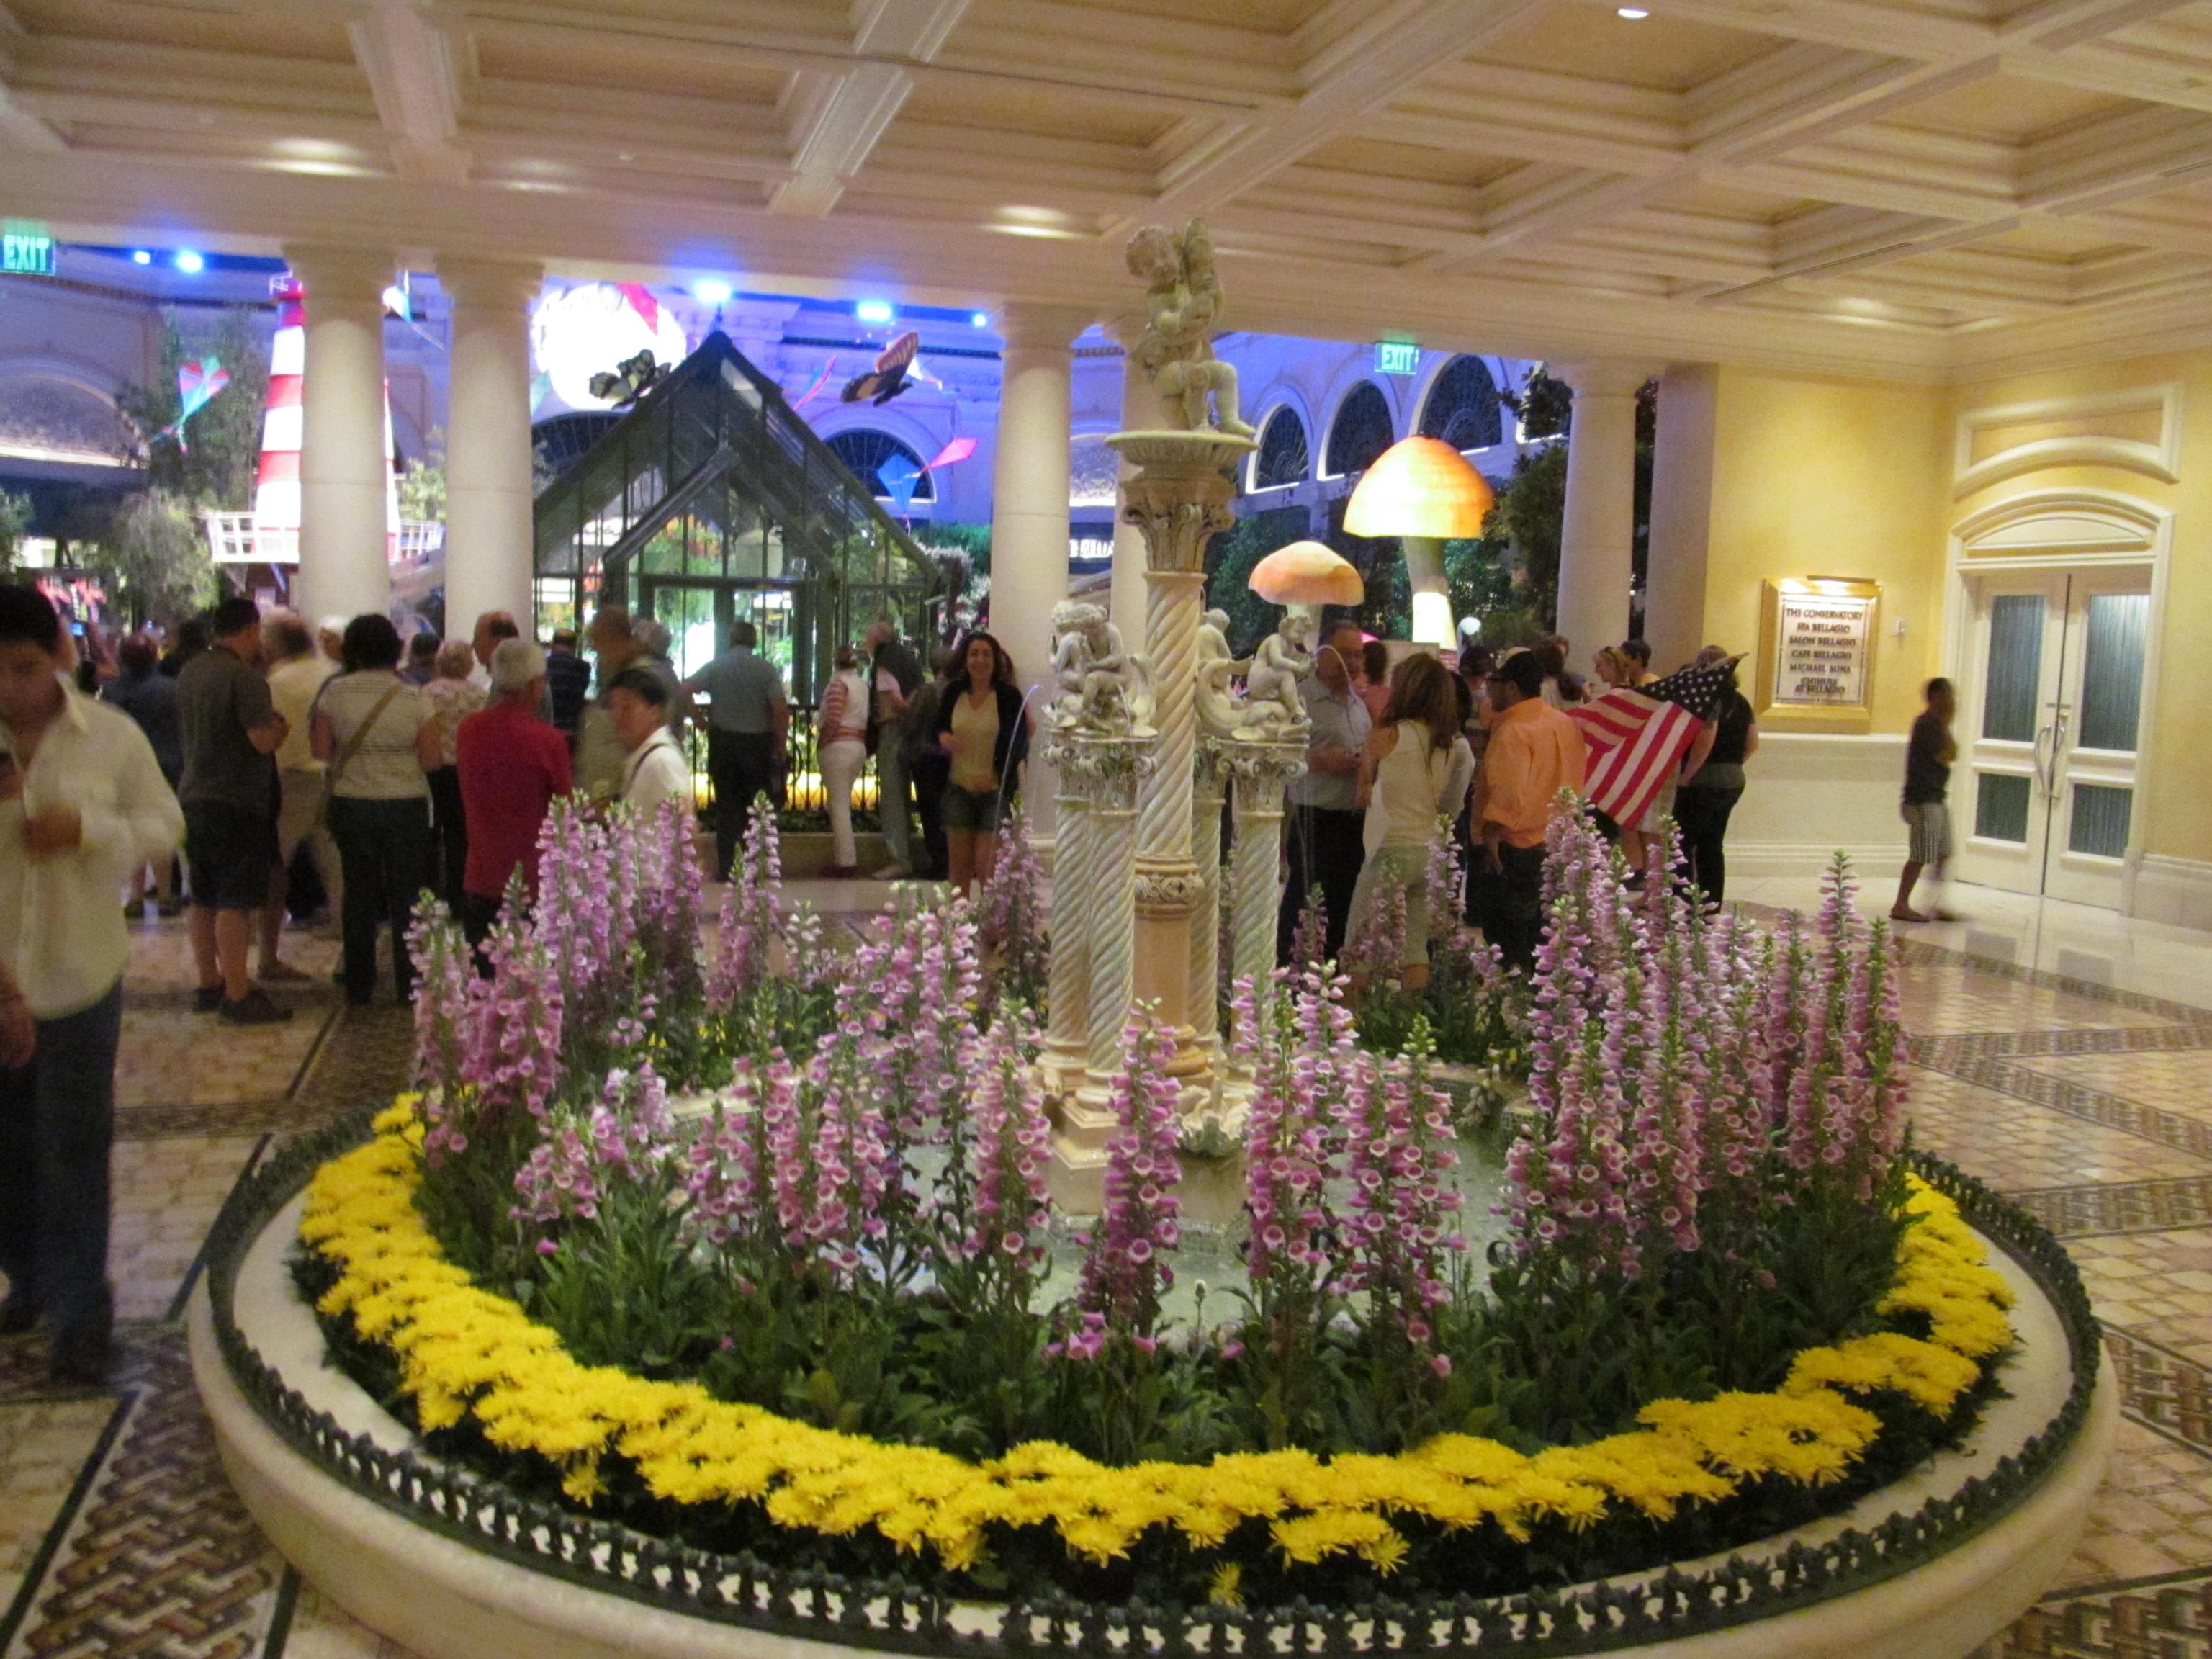 Bellagio Las Vegas, Hotel and Casino - Official Site |Las Vegas Bellagio Hotel Lobby